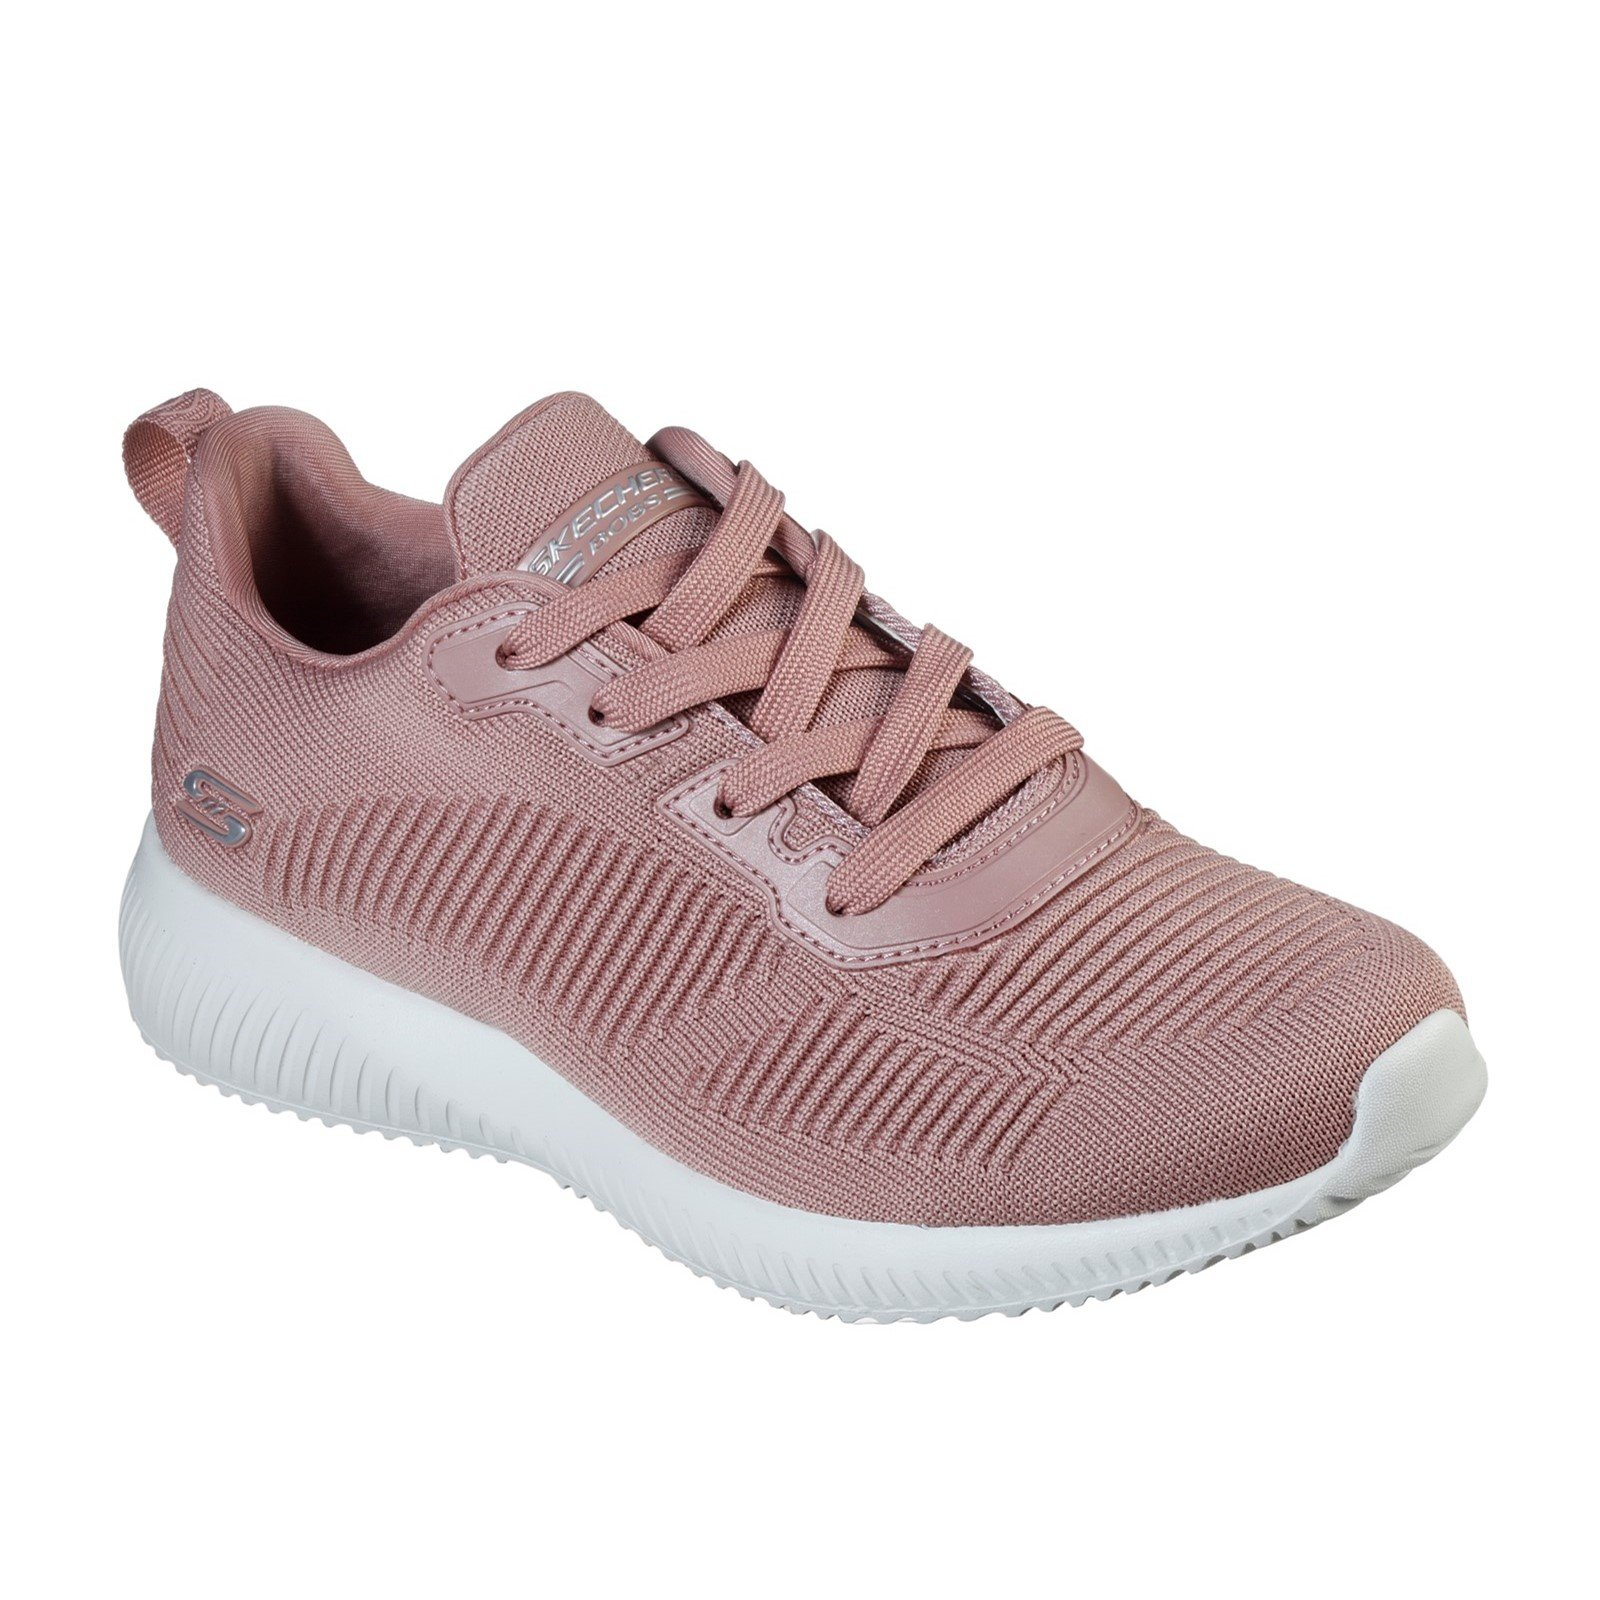 Skechers Women's Bobs Squad Tough Talk Wide Trainer Various Colours 33062 - Pink 4